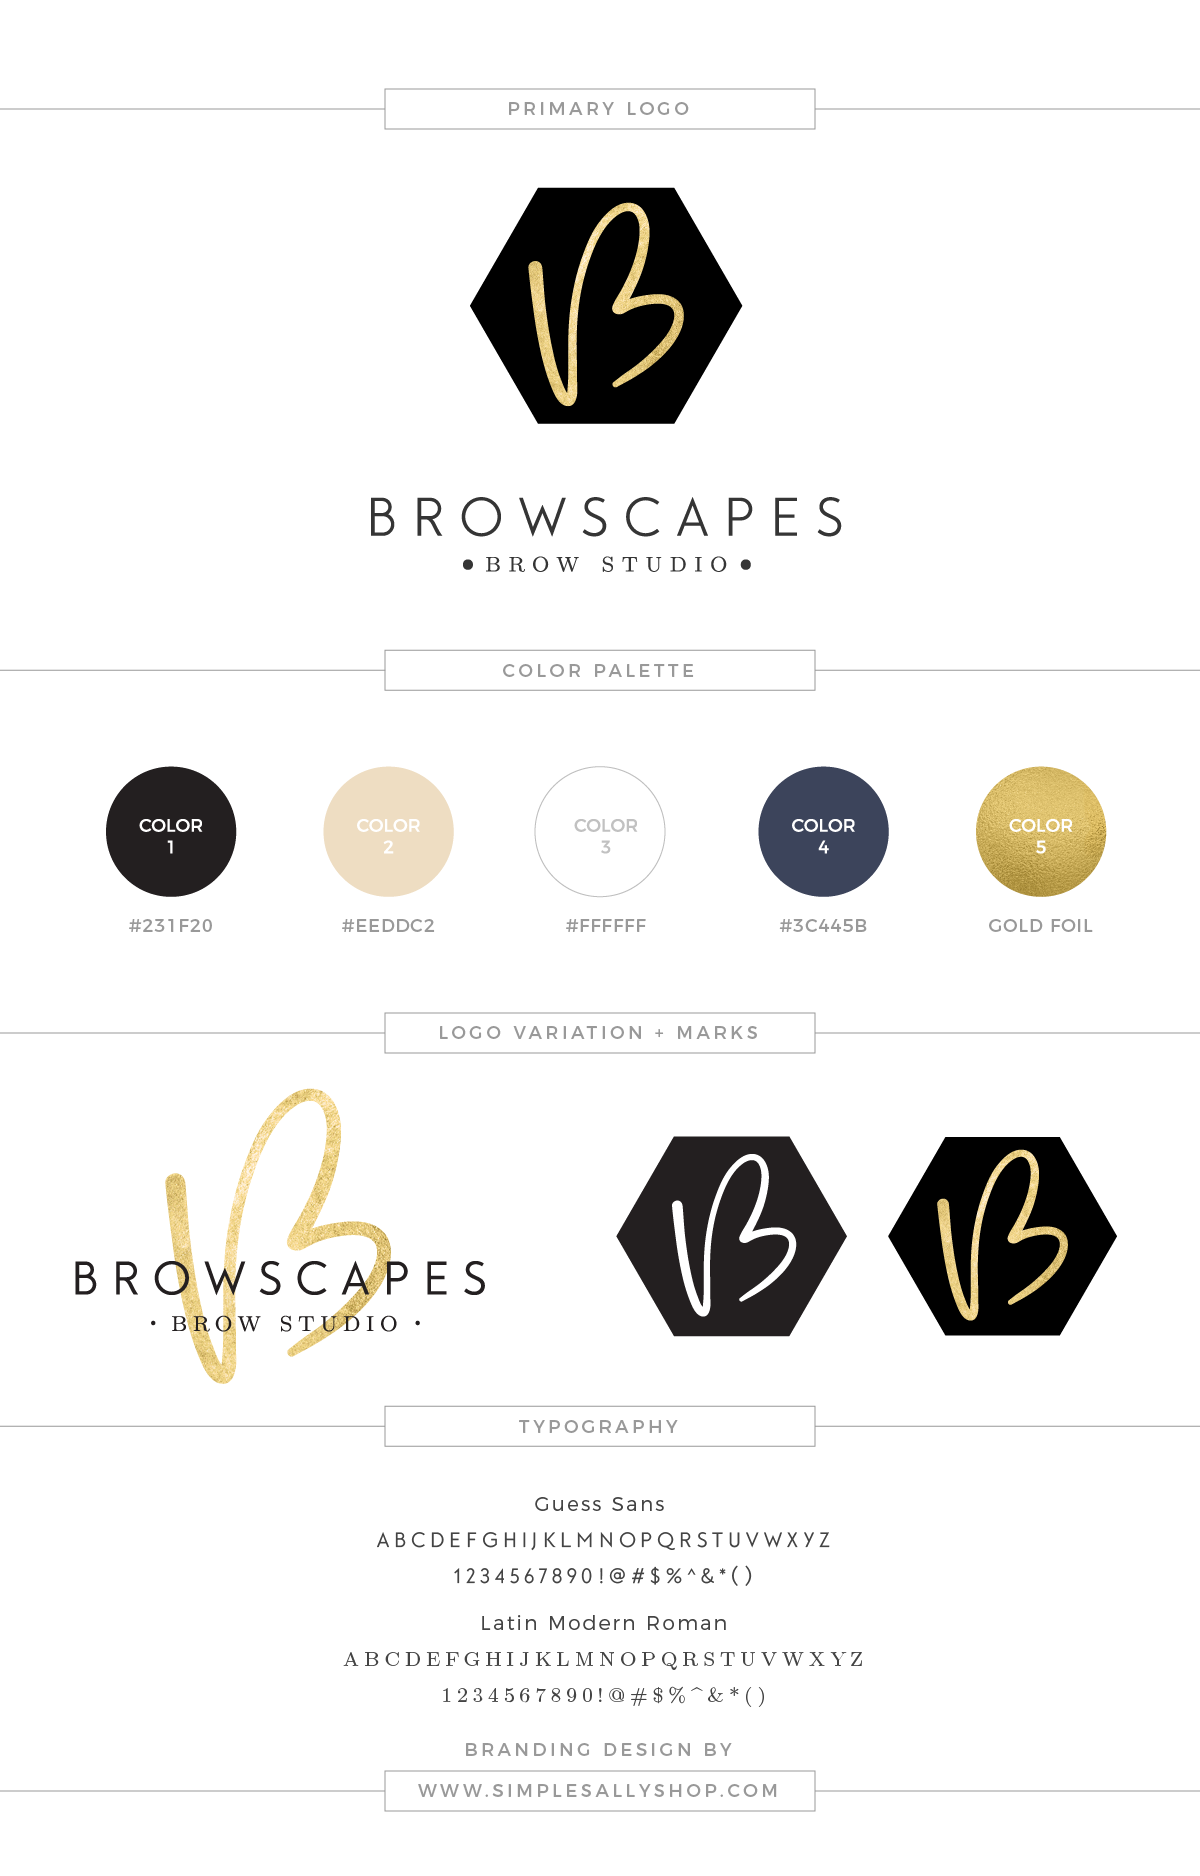 Logo Design by Simple Sally | #brows #simple #logo #simplesally